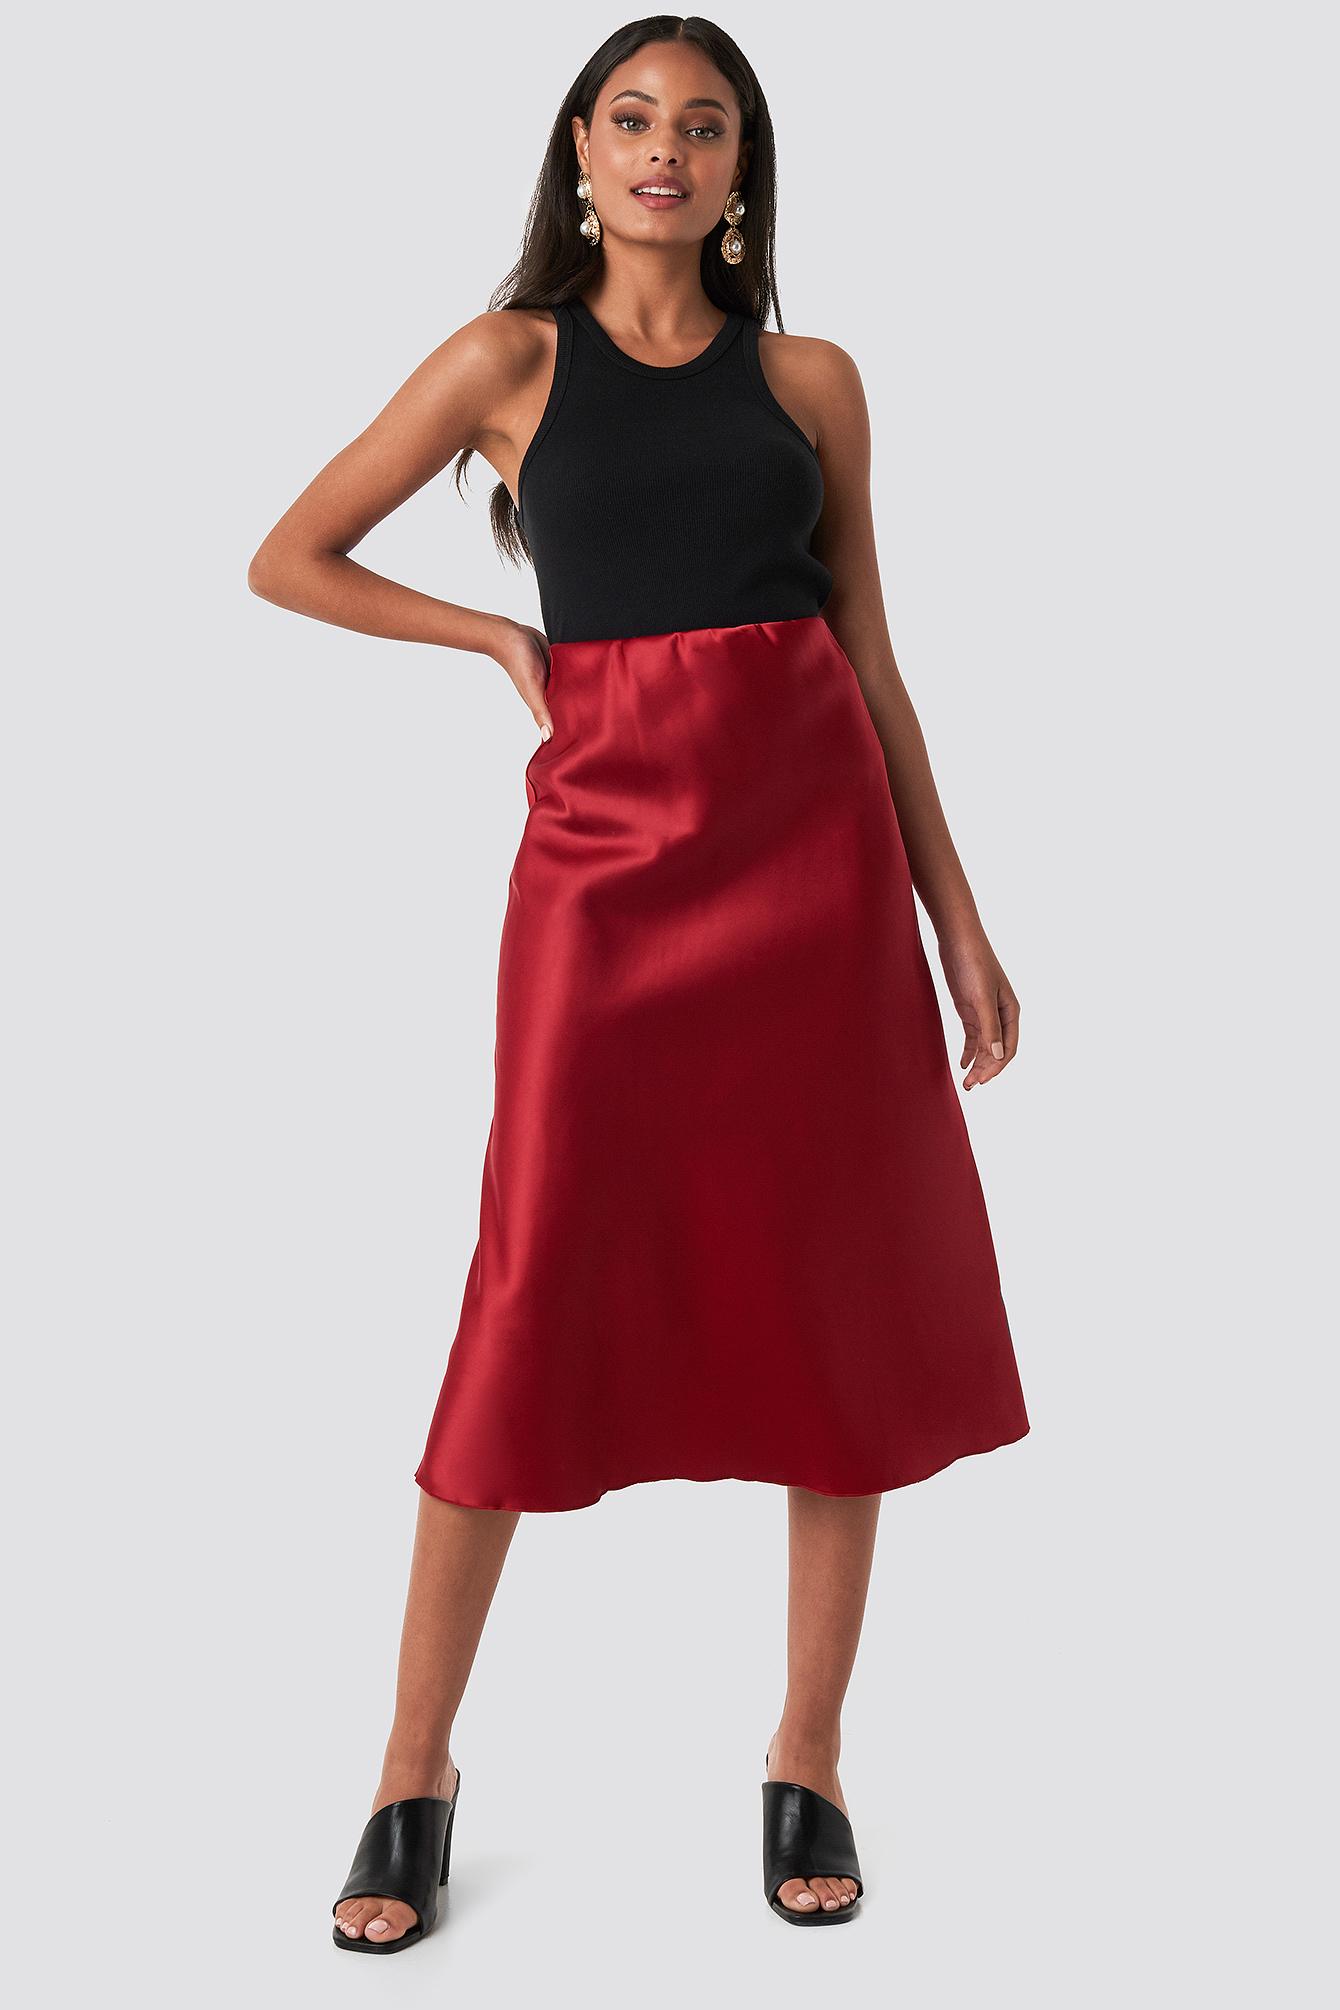 Yol Satin Skirt